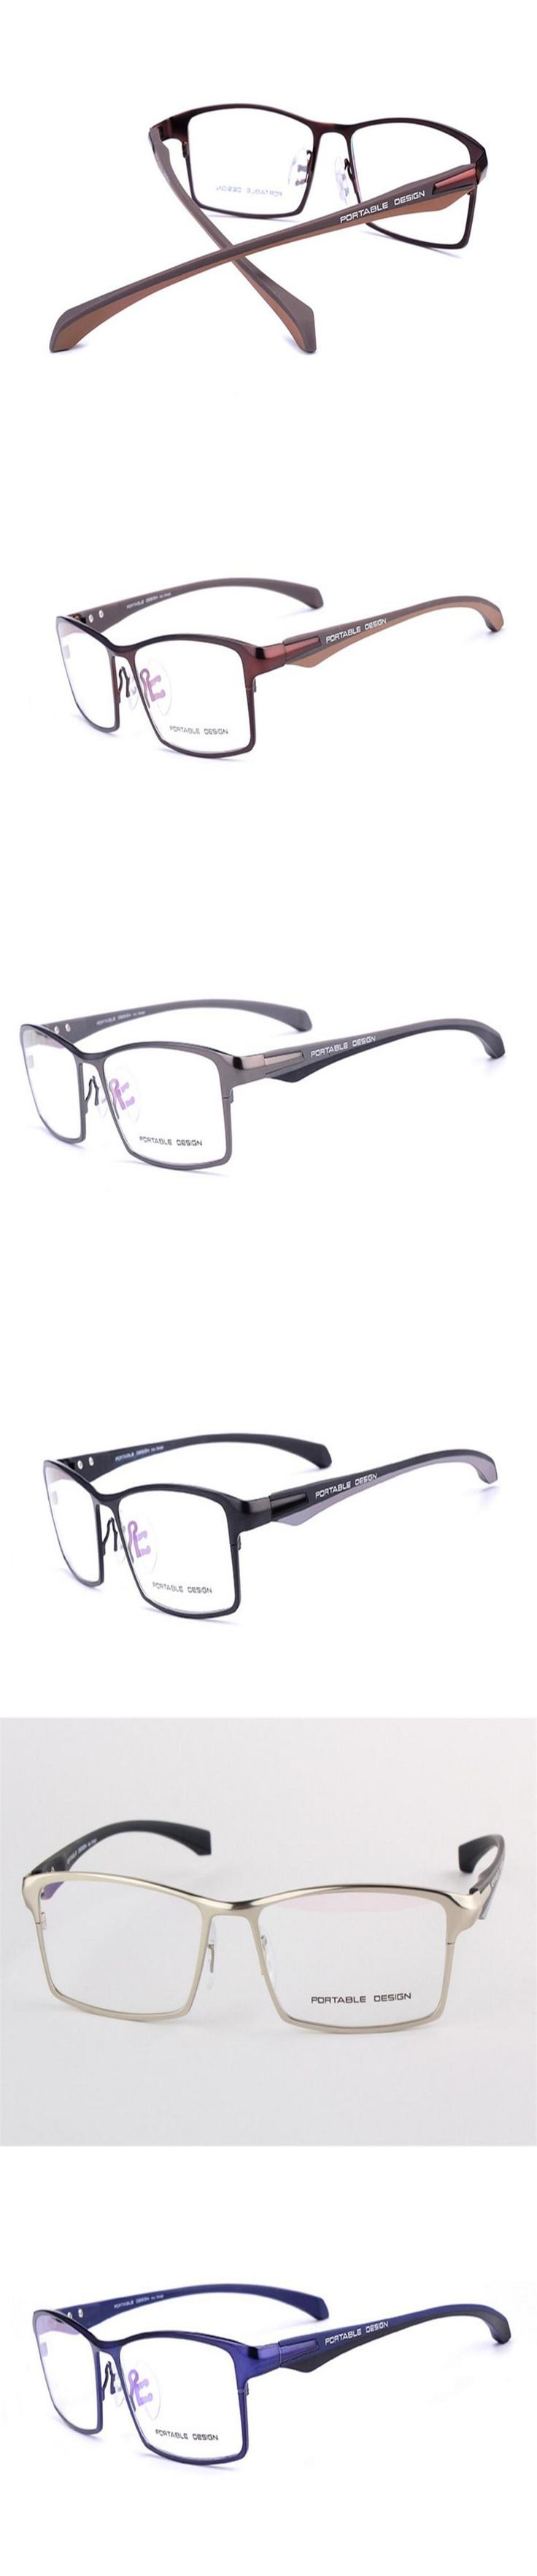 DOWER ME Progressive Multi-focal Lens Business Men Half Rim Alloy Optical Eyewear Frame See Near Far Presbyopia Reading Eyeglass